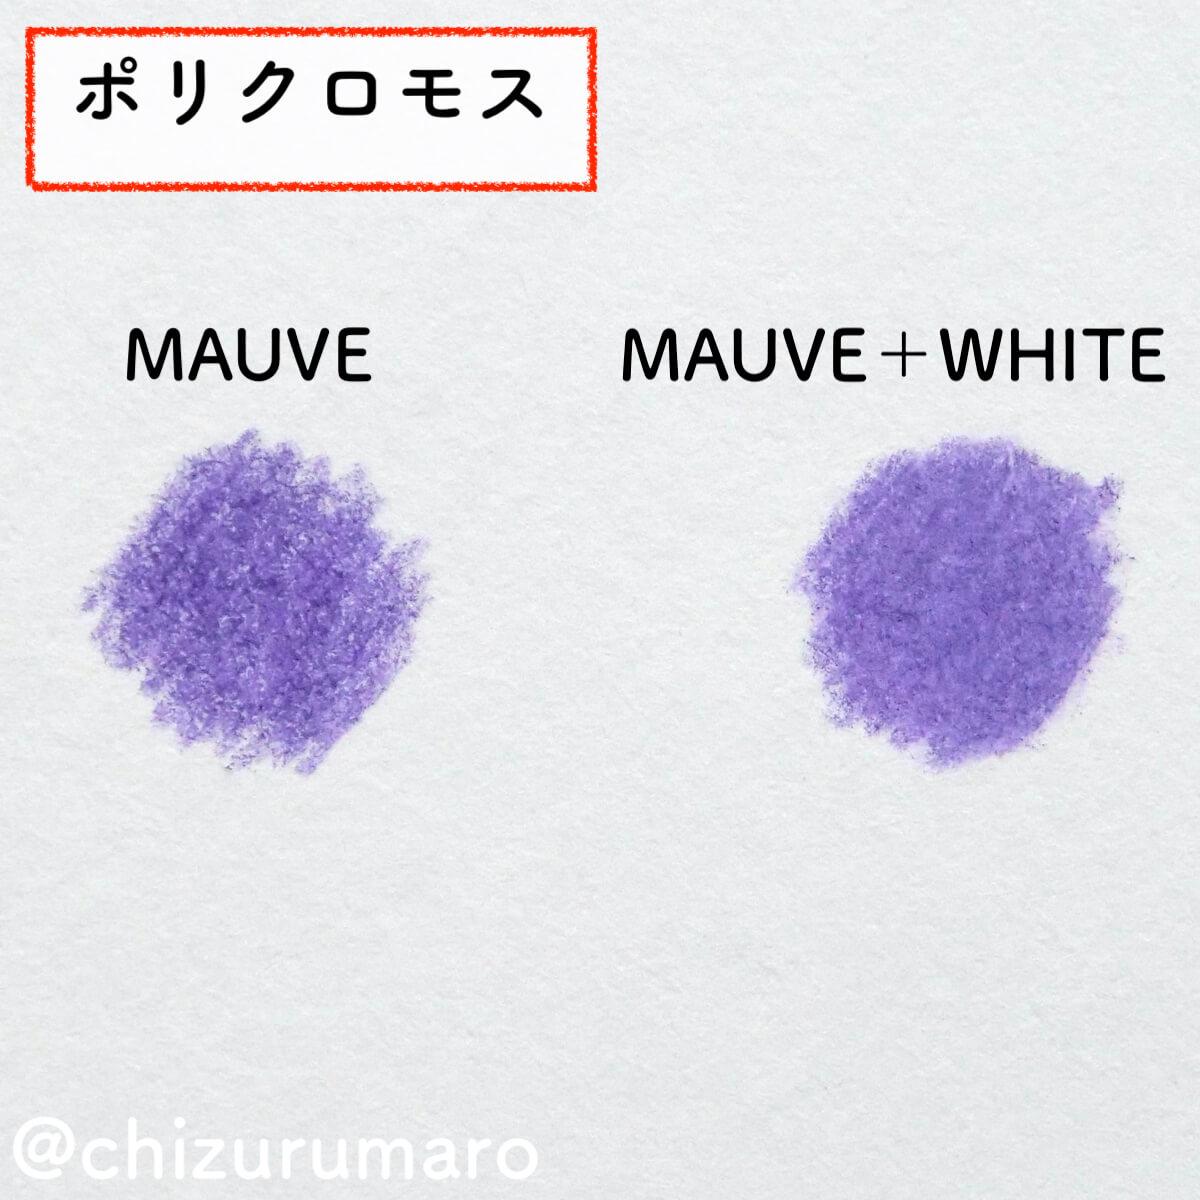 f:id:chizurumaro:20210805135045j:plain